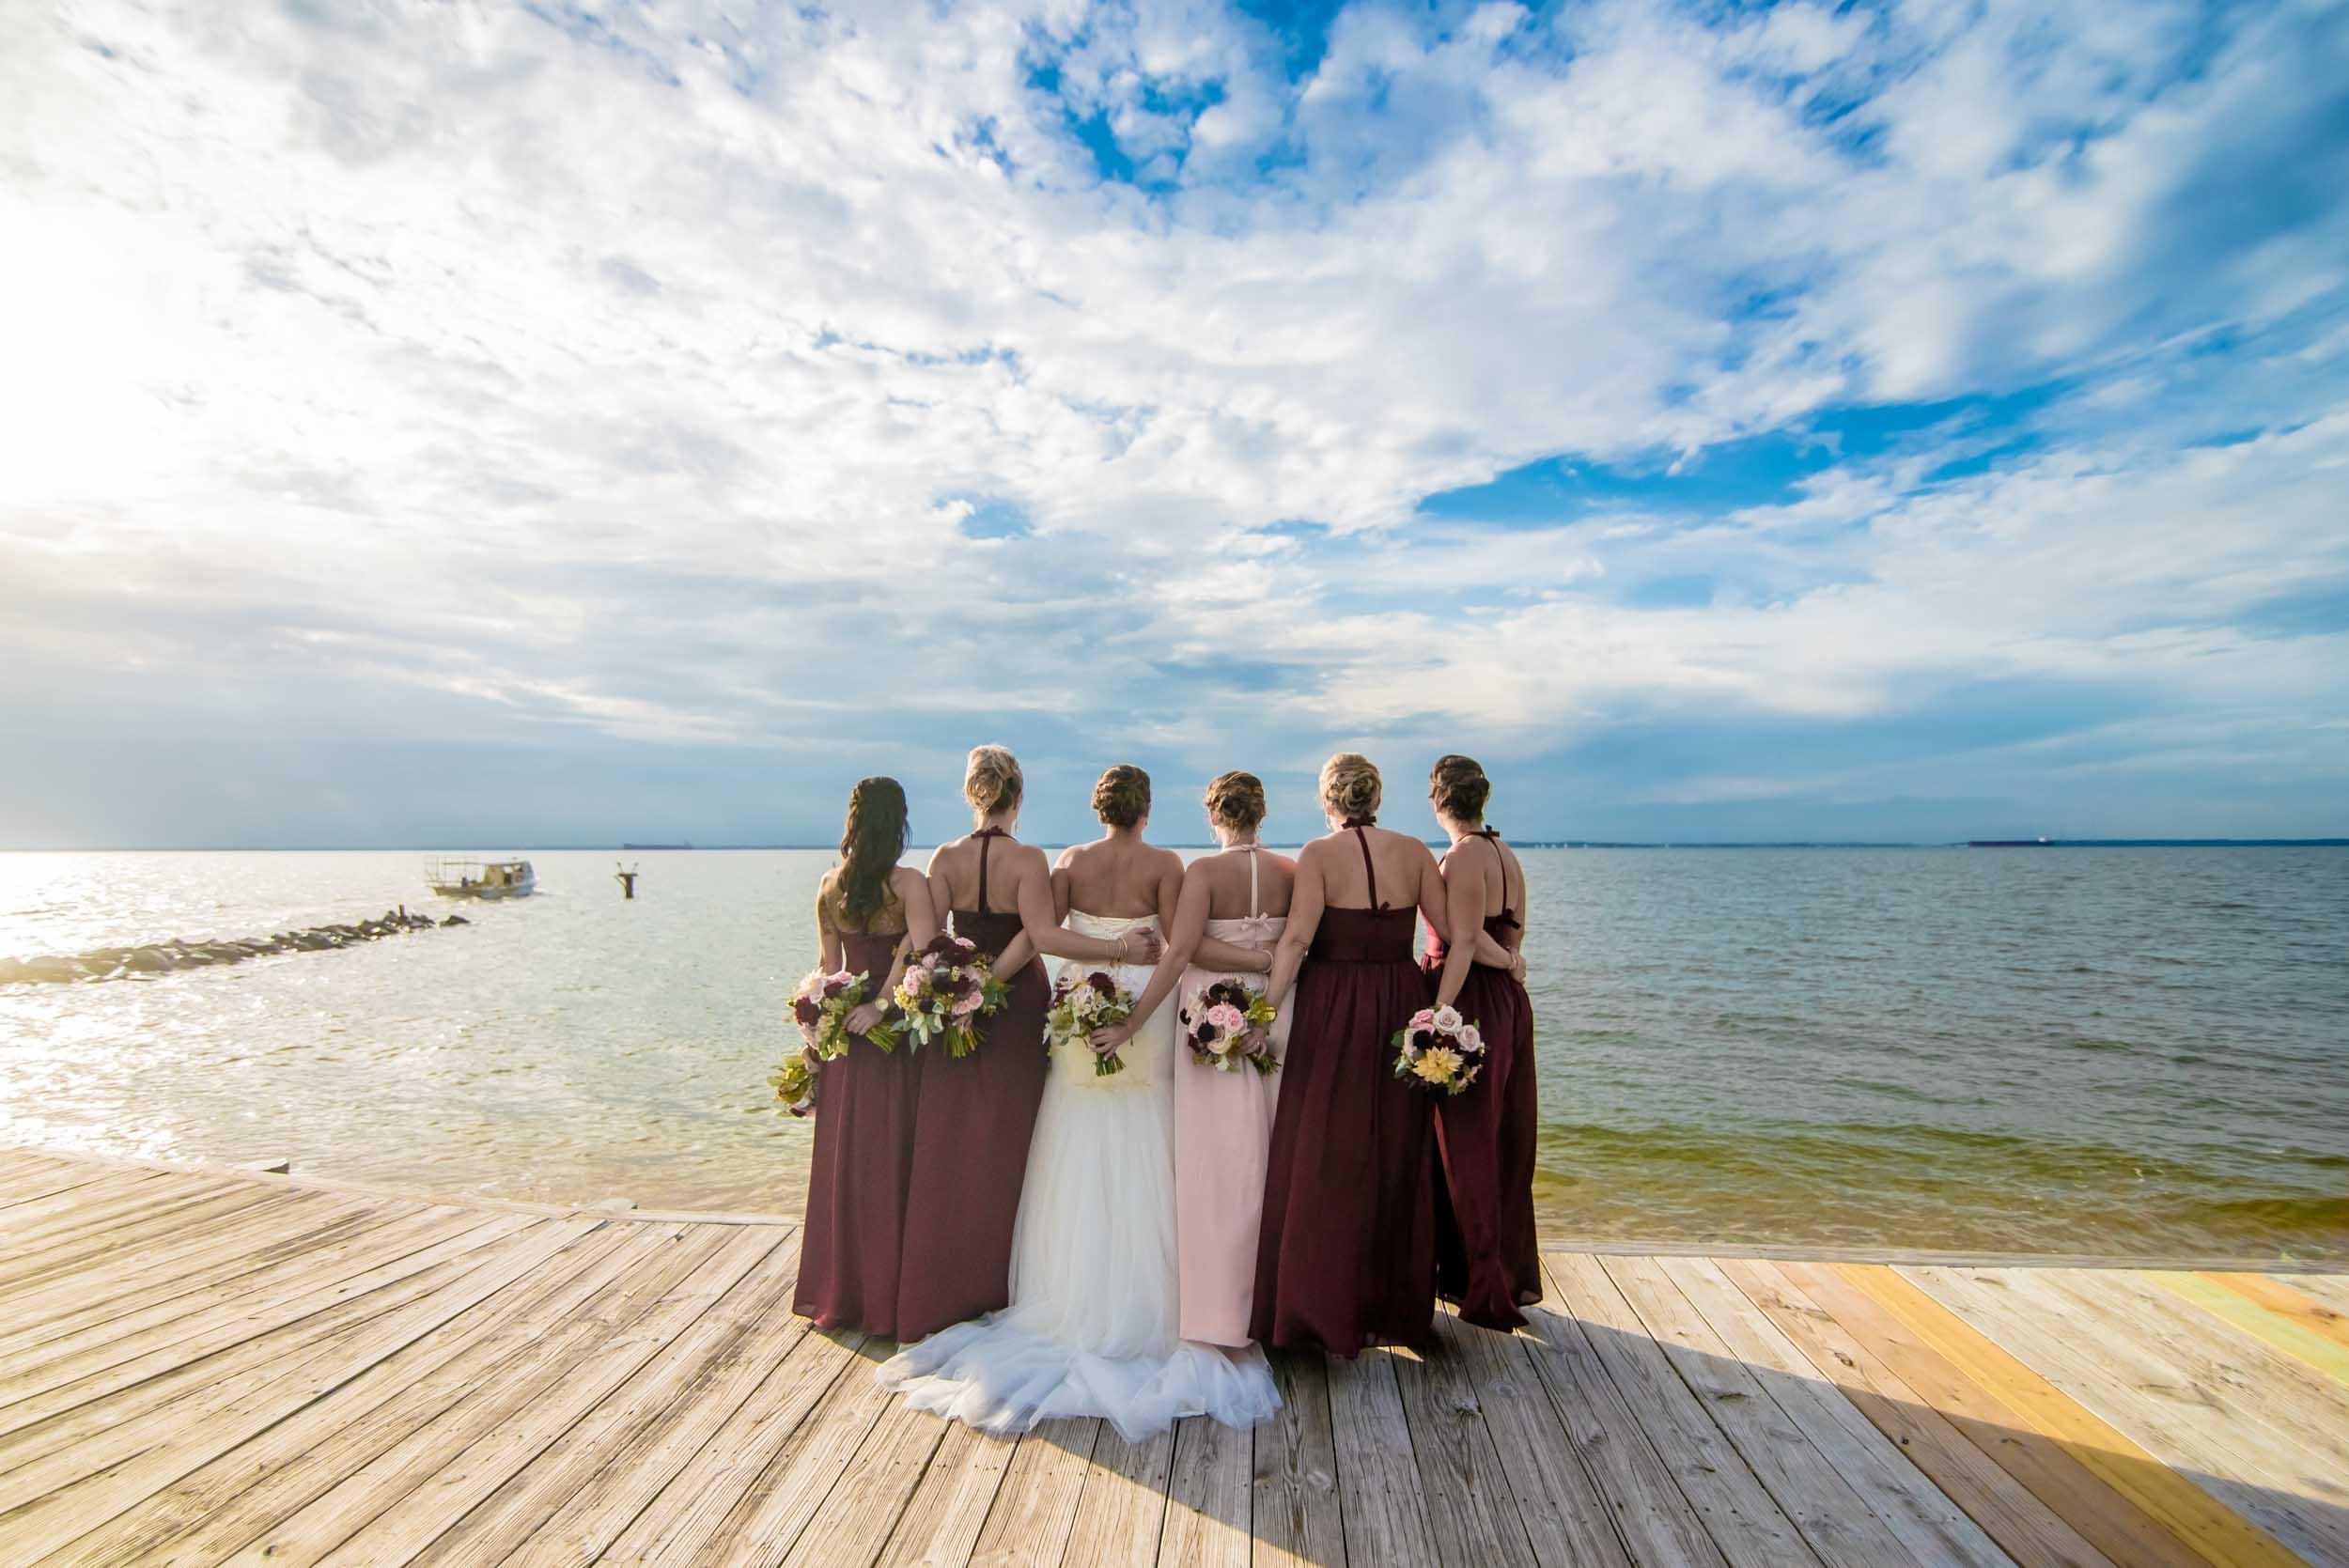 dc+metro+wedding+photographer+vadym+guliuk+photography+weddings+bridesmaids-2023.jpg